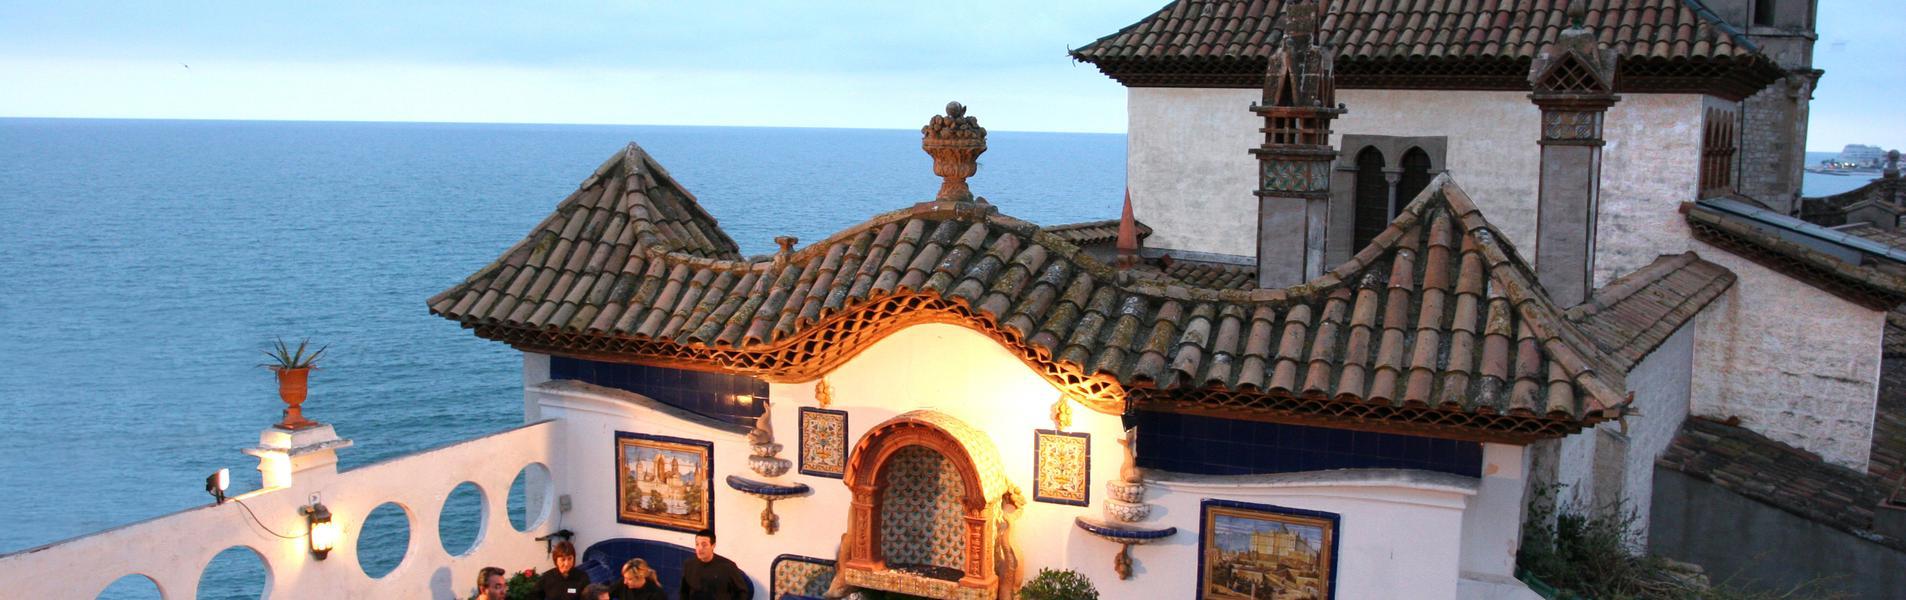 Museo Maricel